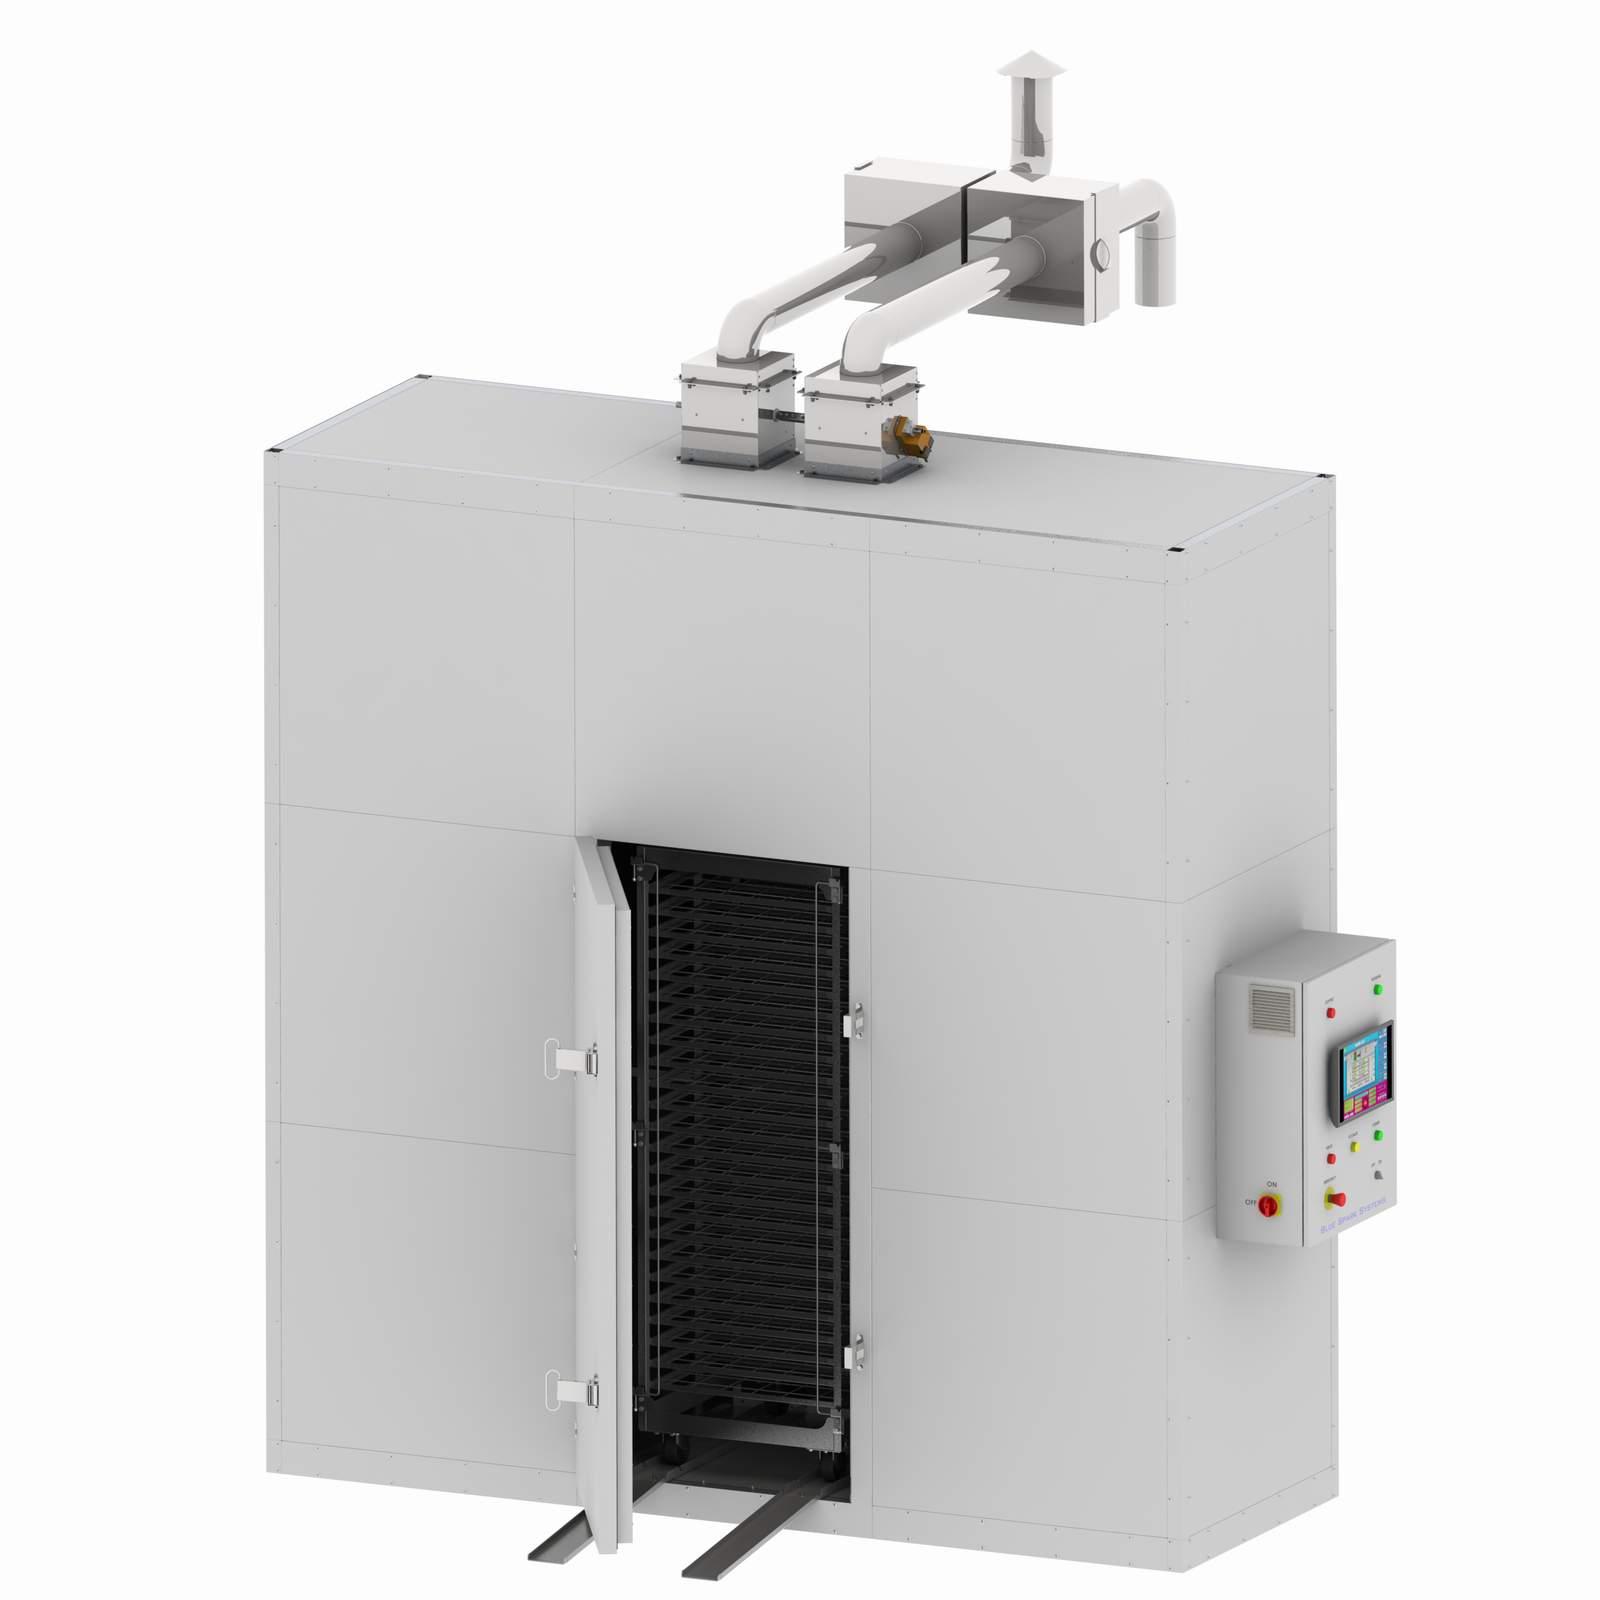 Deshidrator FD-1x1 50kg